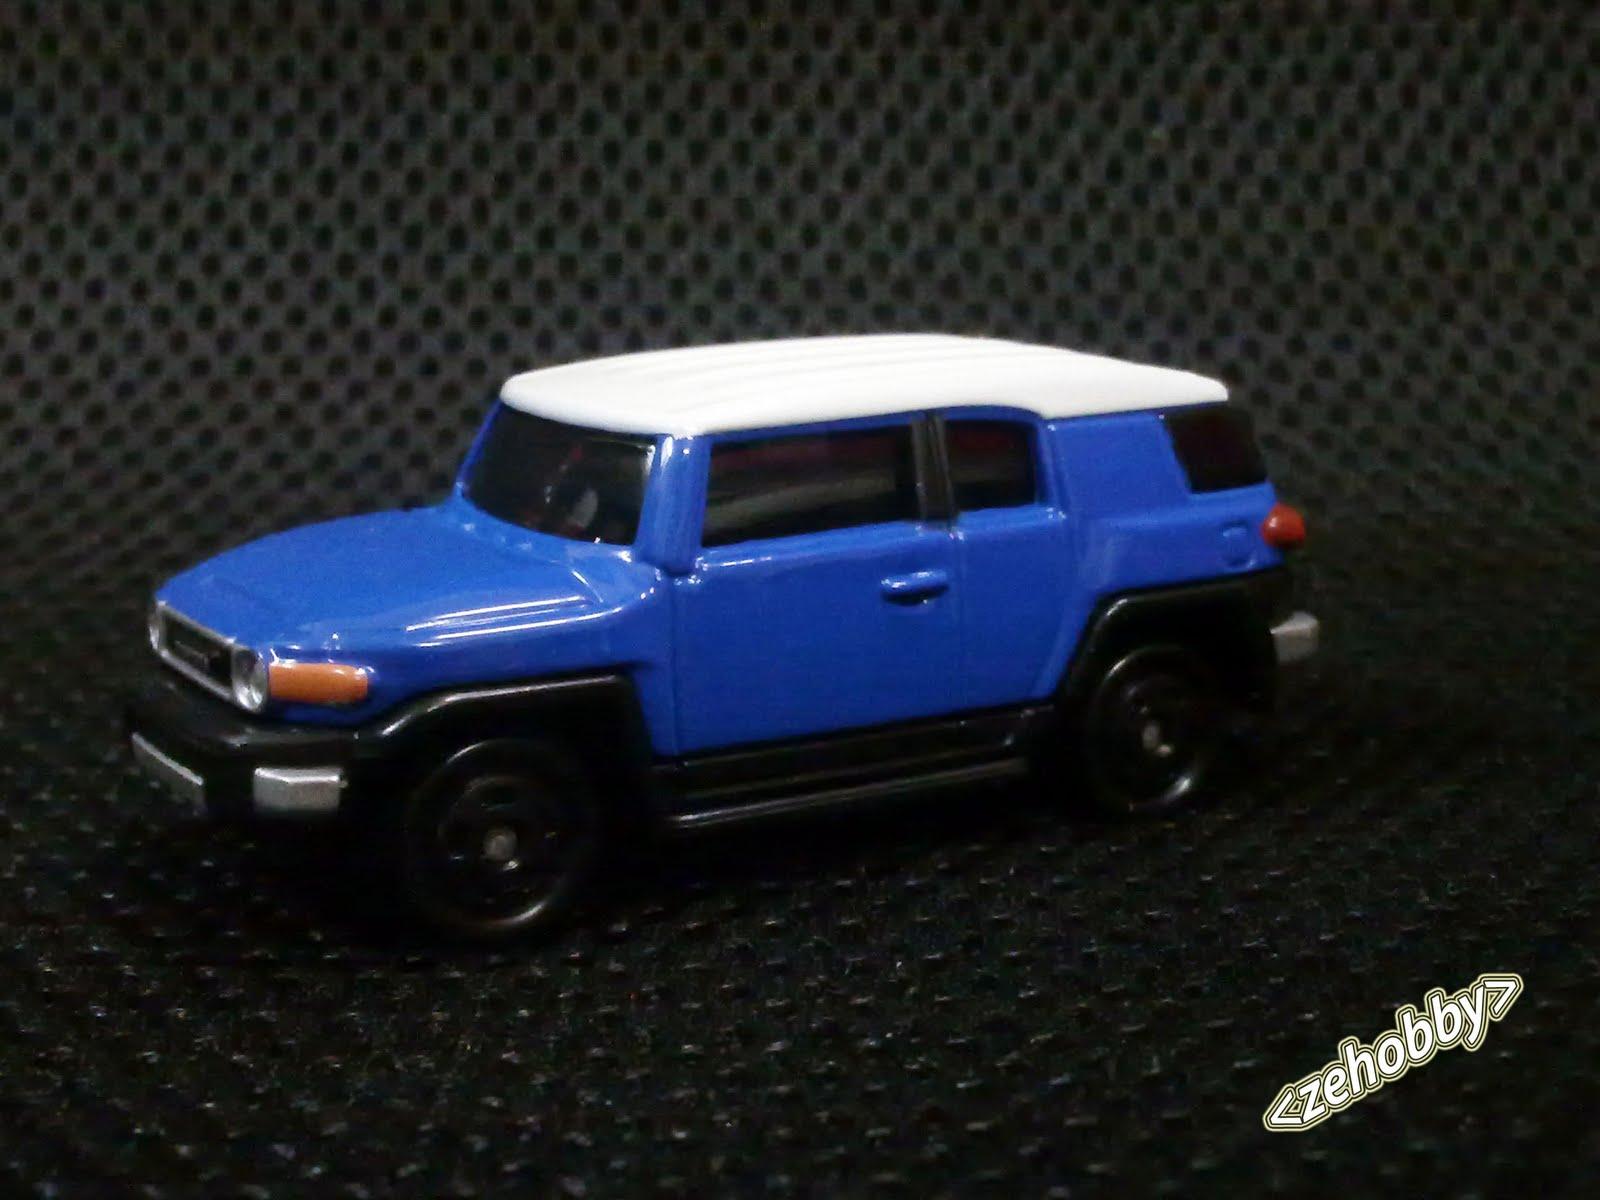 Zehobby Tomica Toyota FJ Cruiser